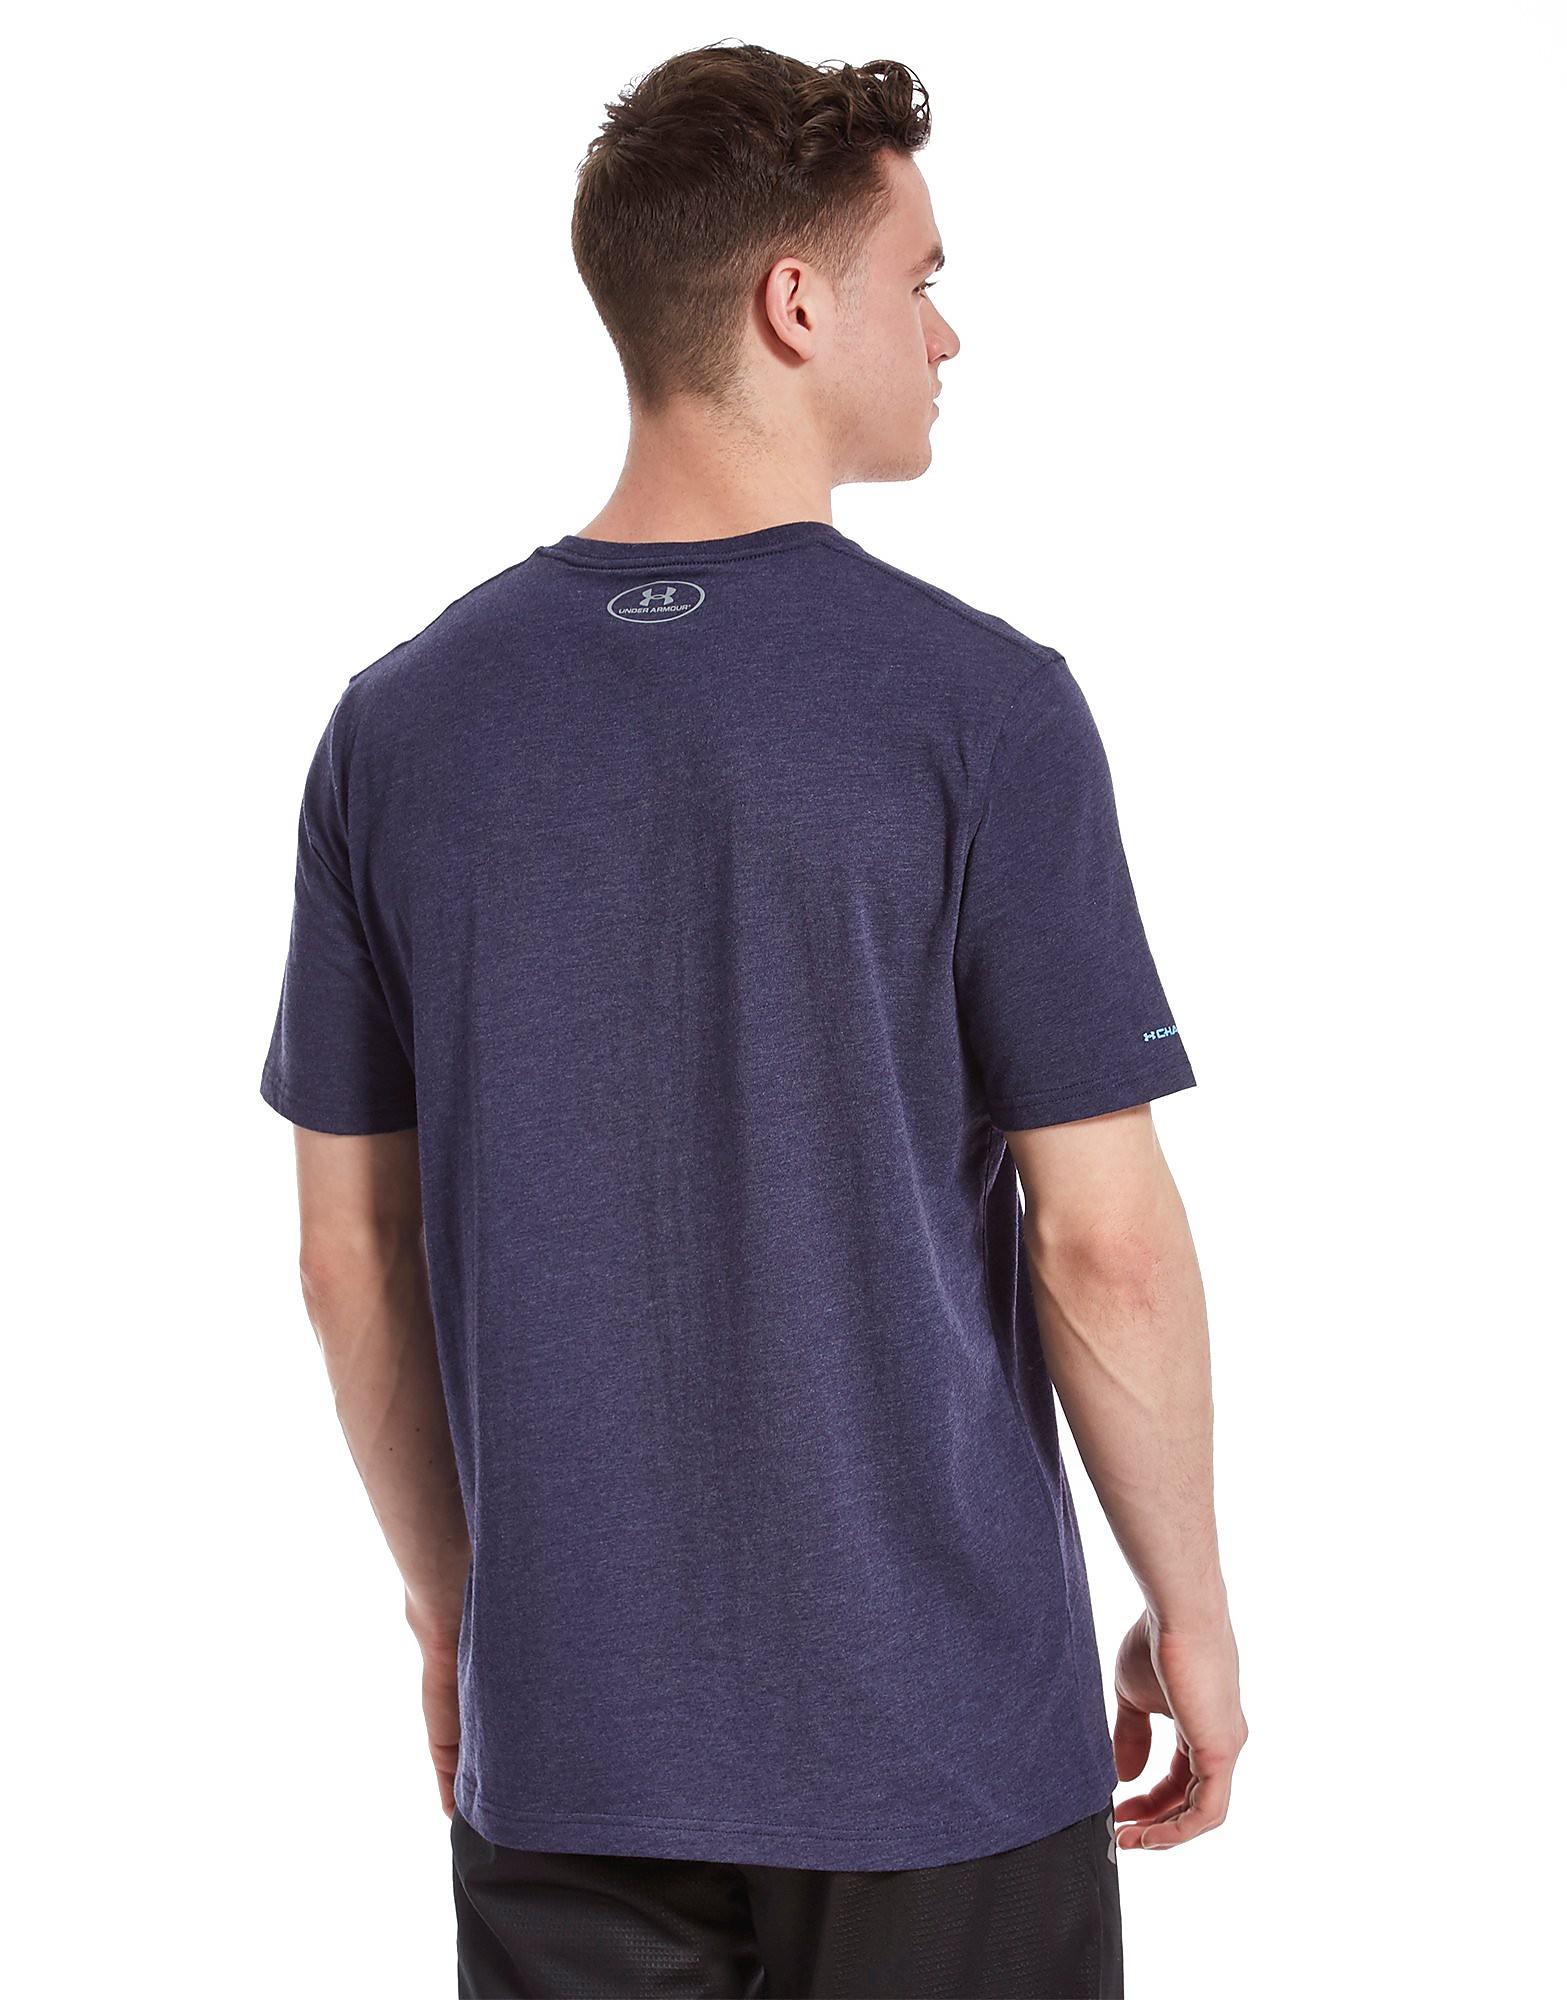 Under Armour Sportstyle Left Chest Logo T-Shirt